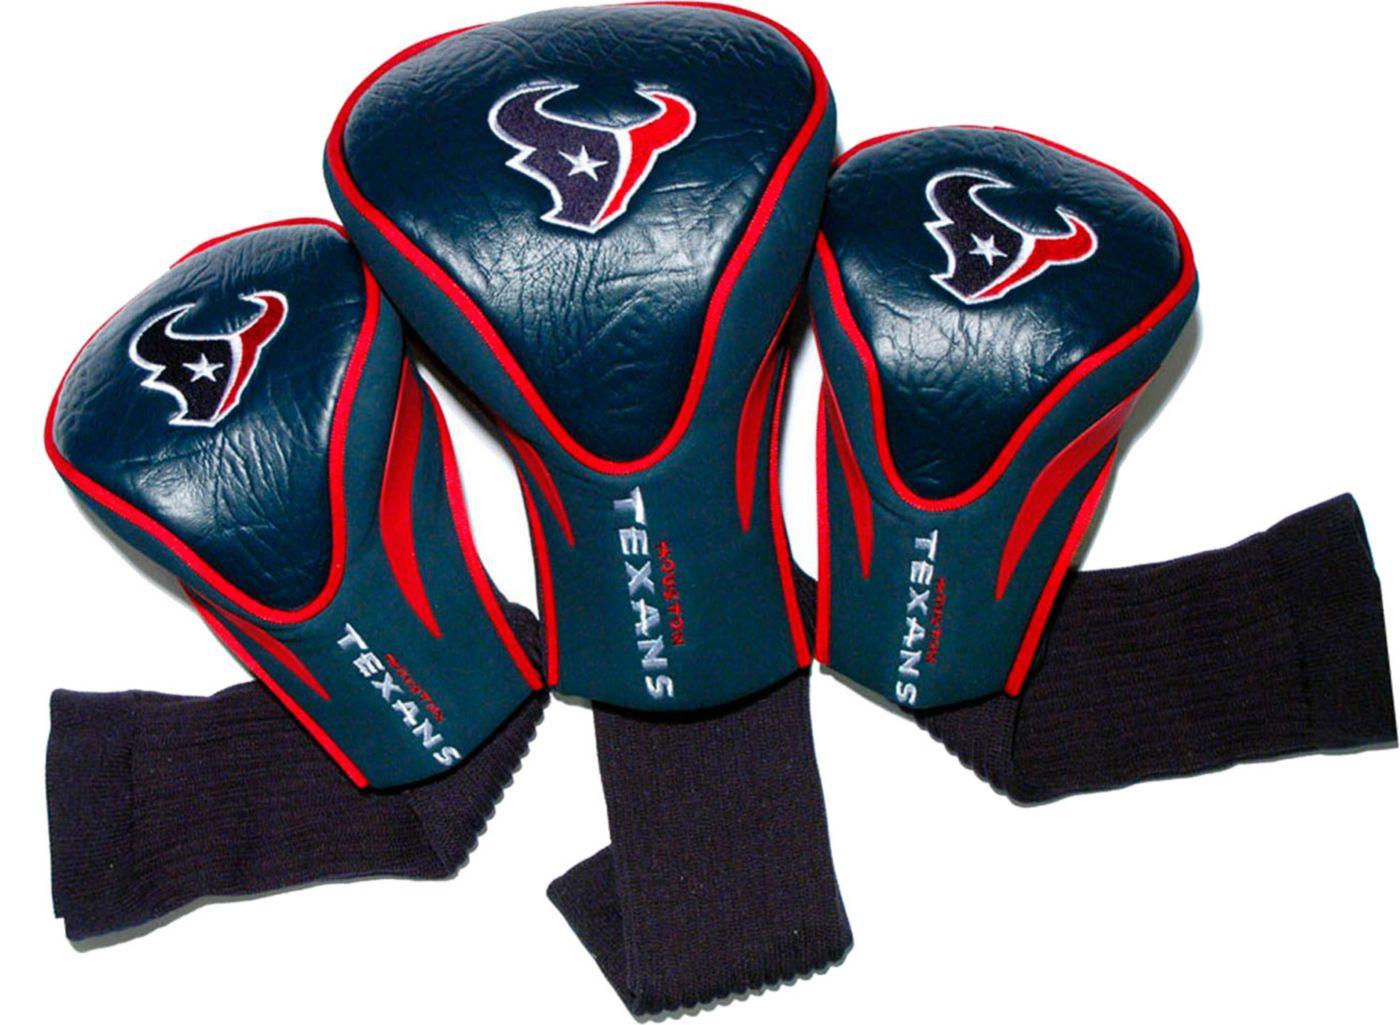 Team Golf Houston Texans Contour Sock Headcovers - 3 Pack